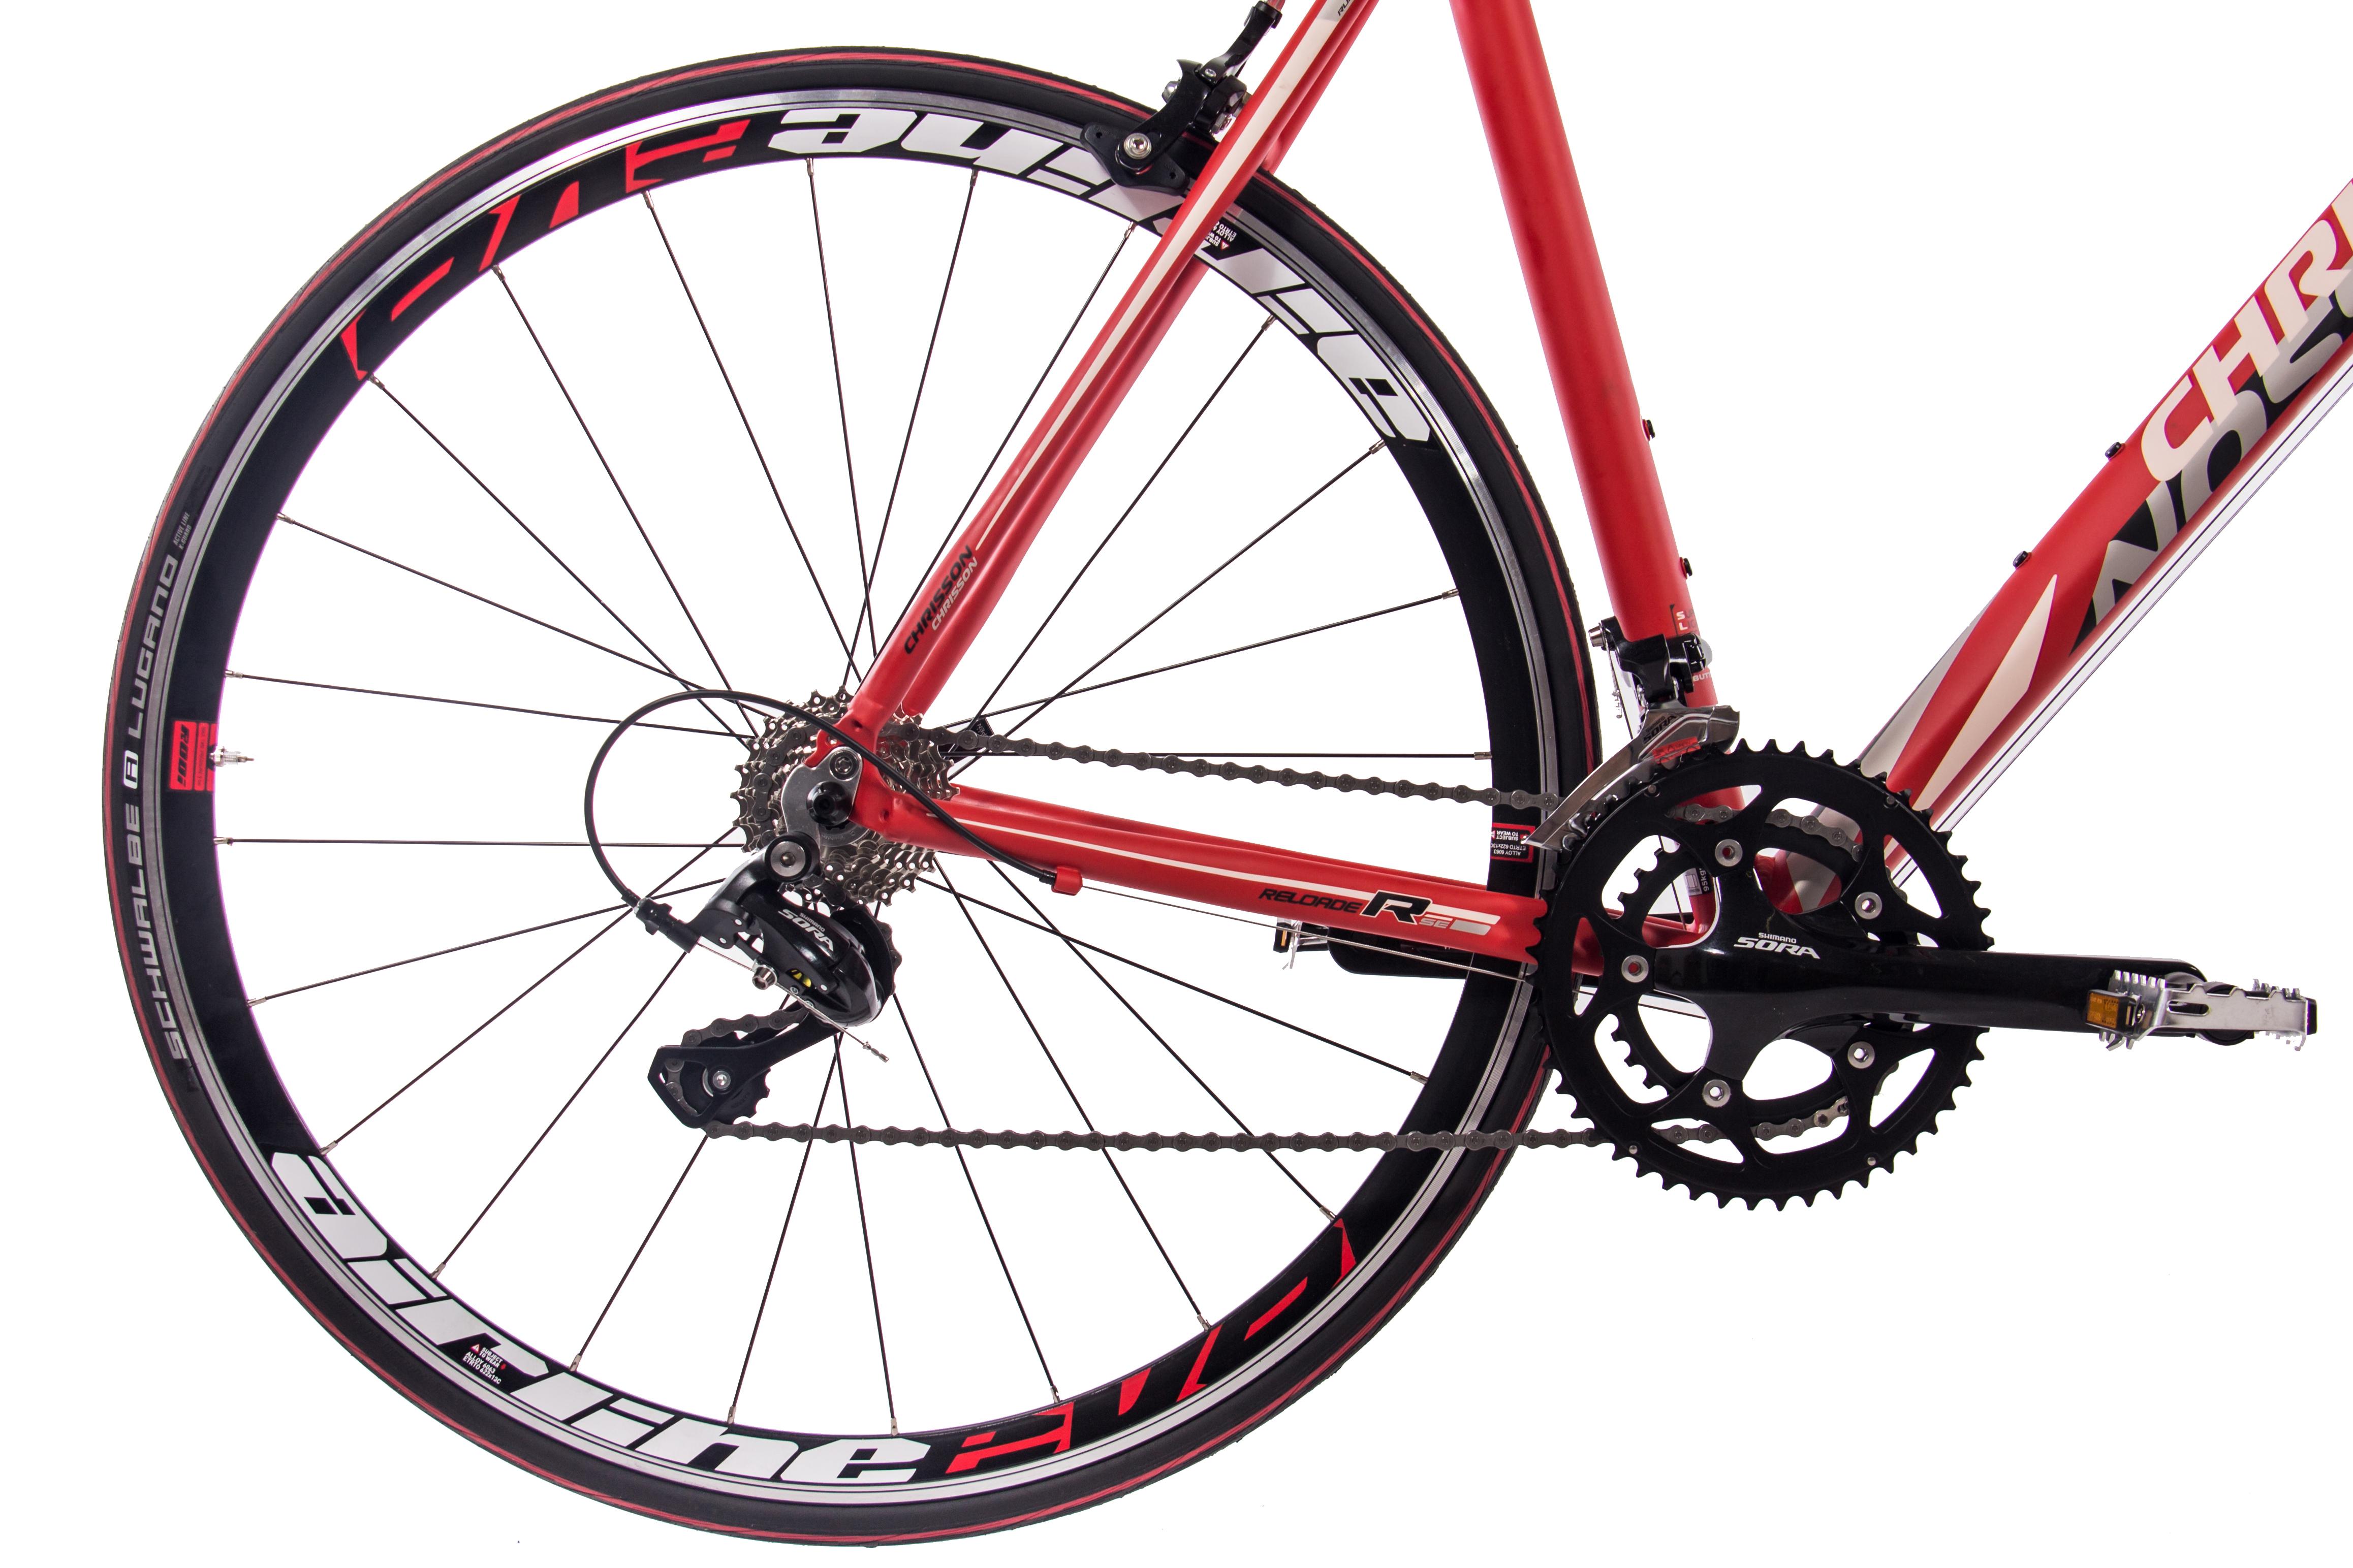 28-034-Zoll-ALU-Rennrad-Fahrrad-CHRISSON-RELOADER-mit-18G-SORA-CARBONGABEL-rot Indexbild 16